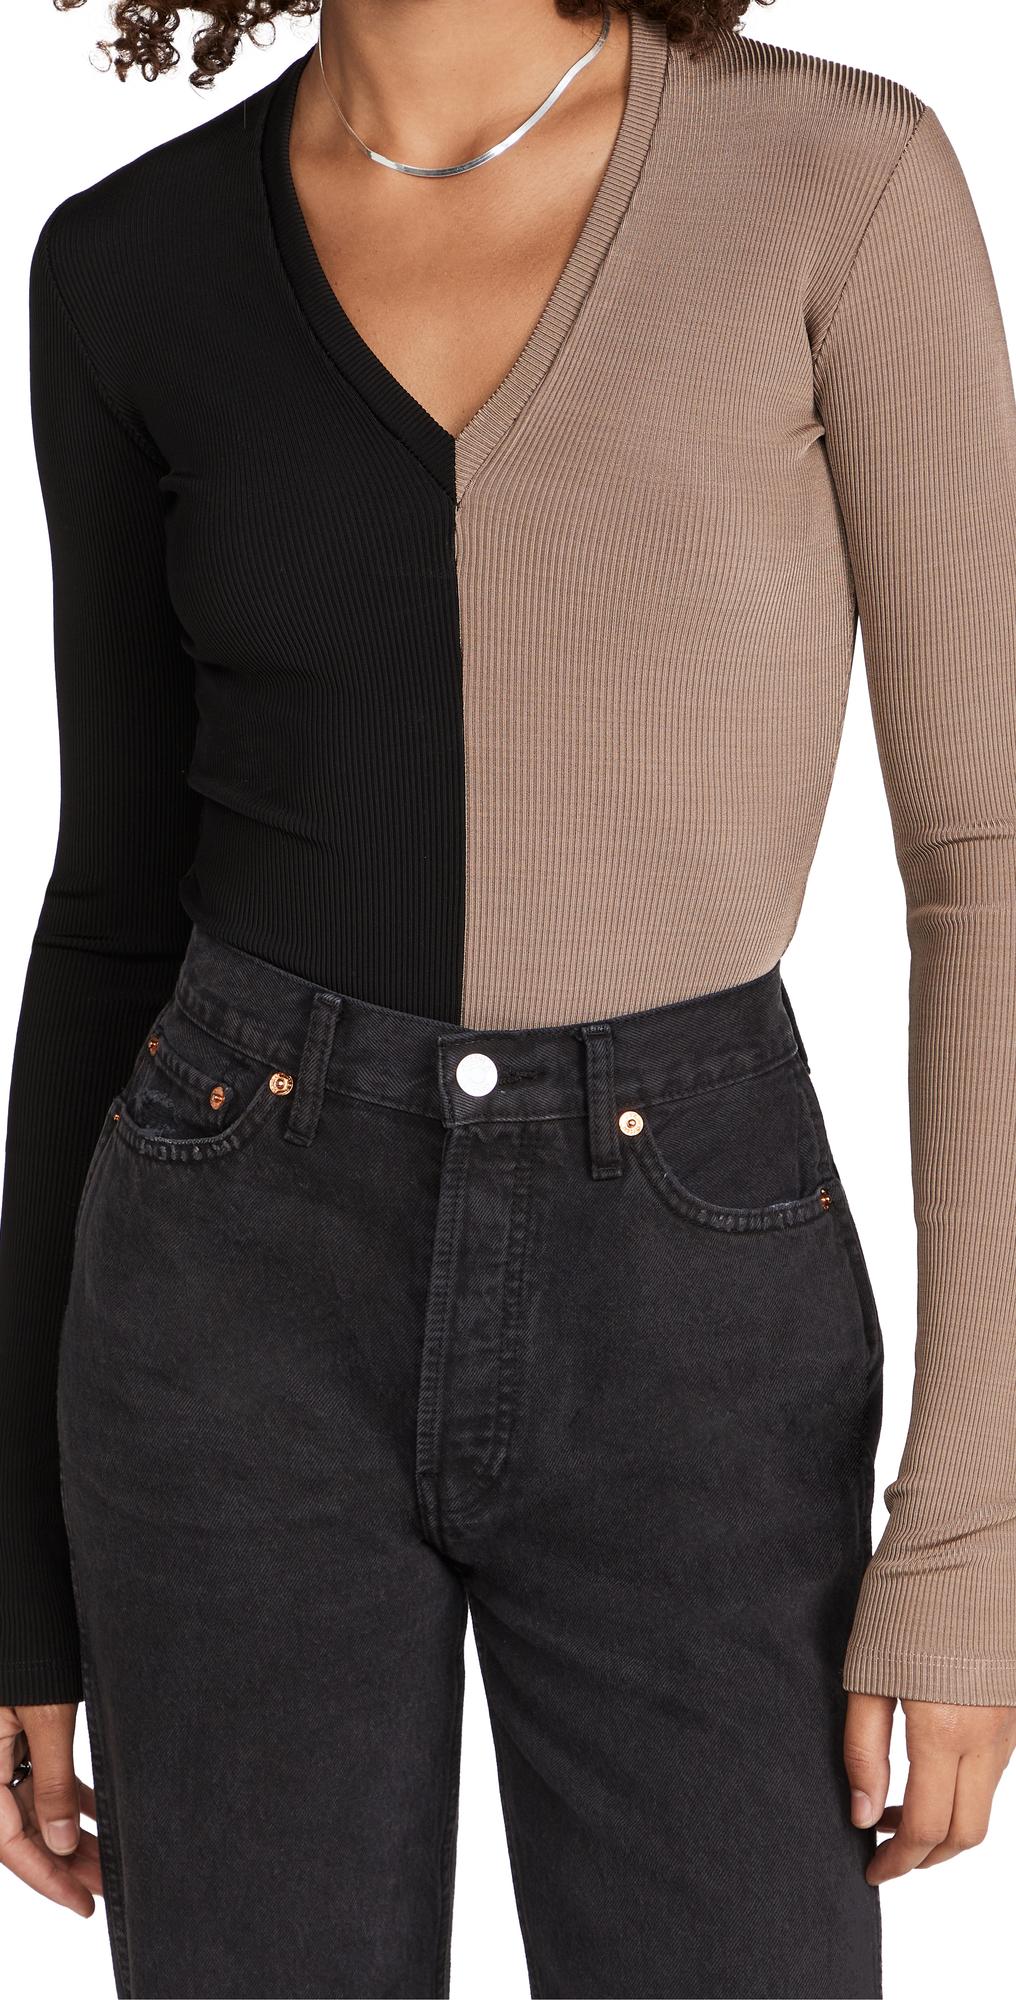 The Rib Deep V Bodysuit